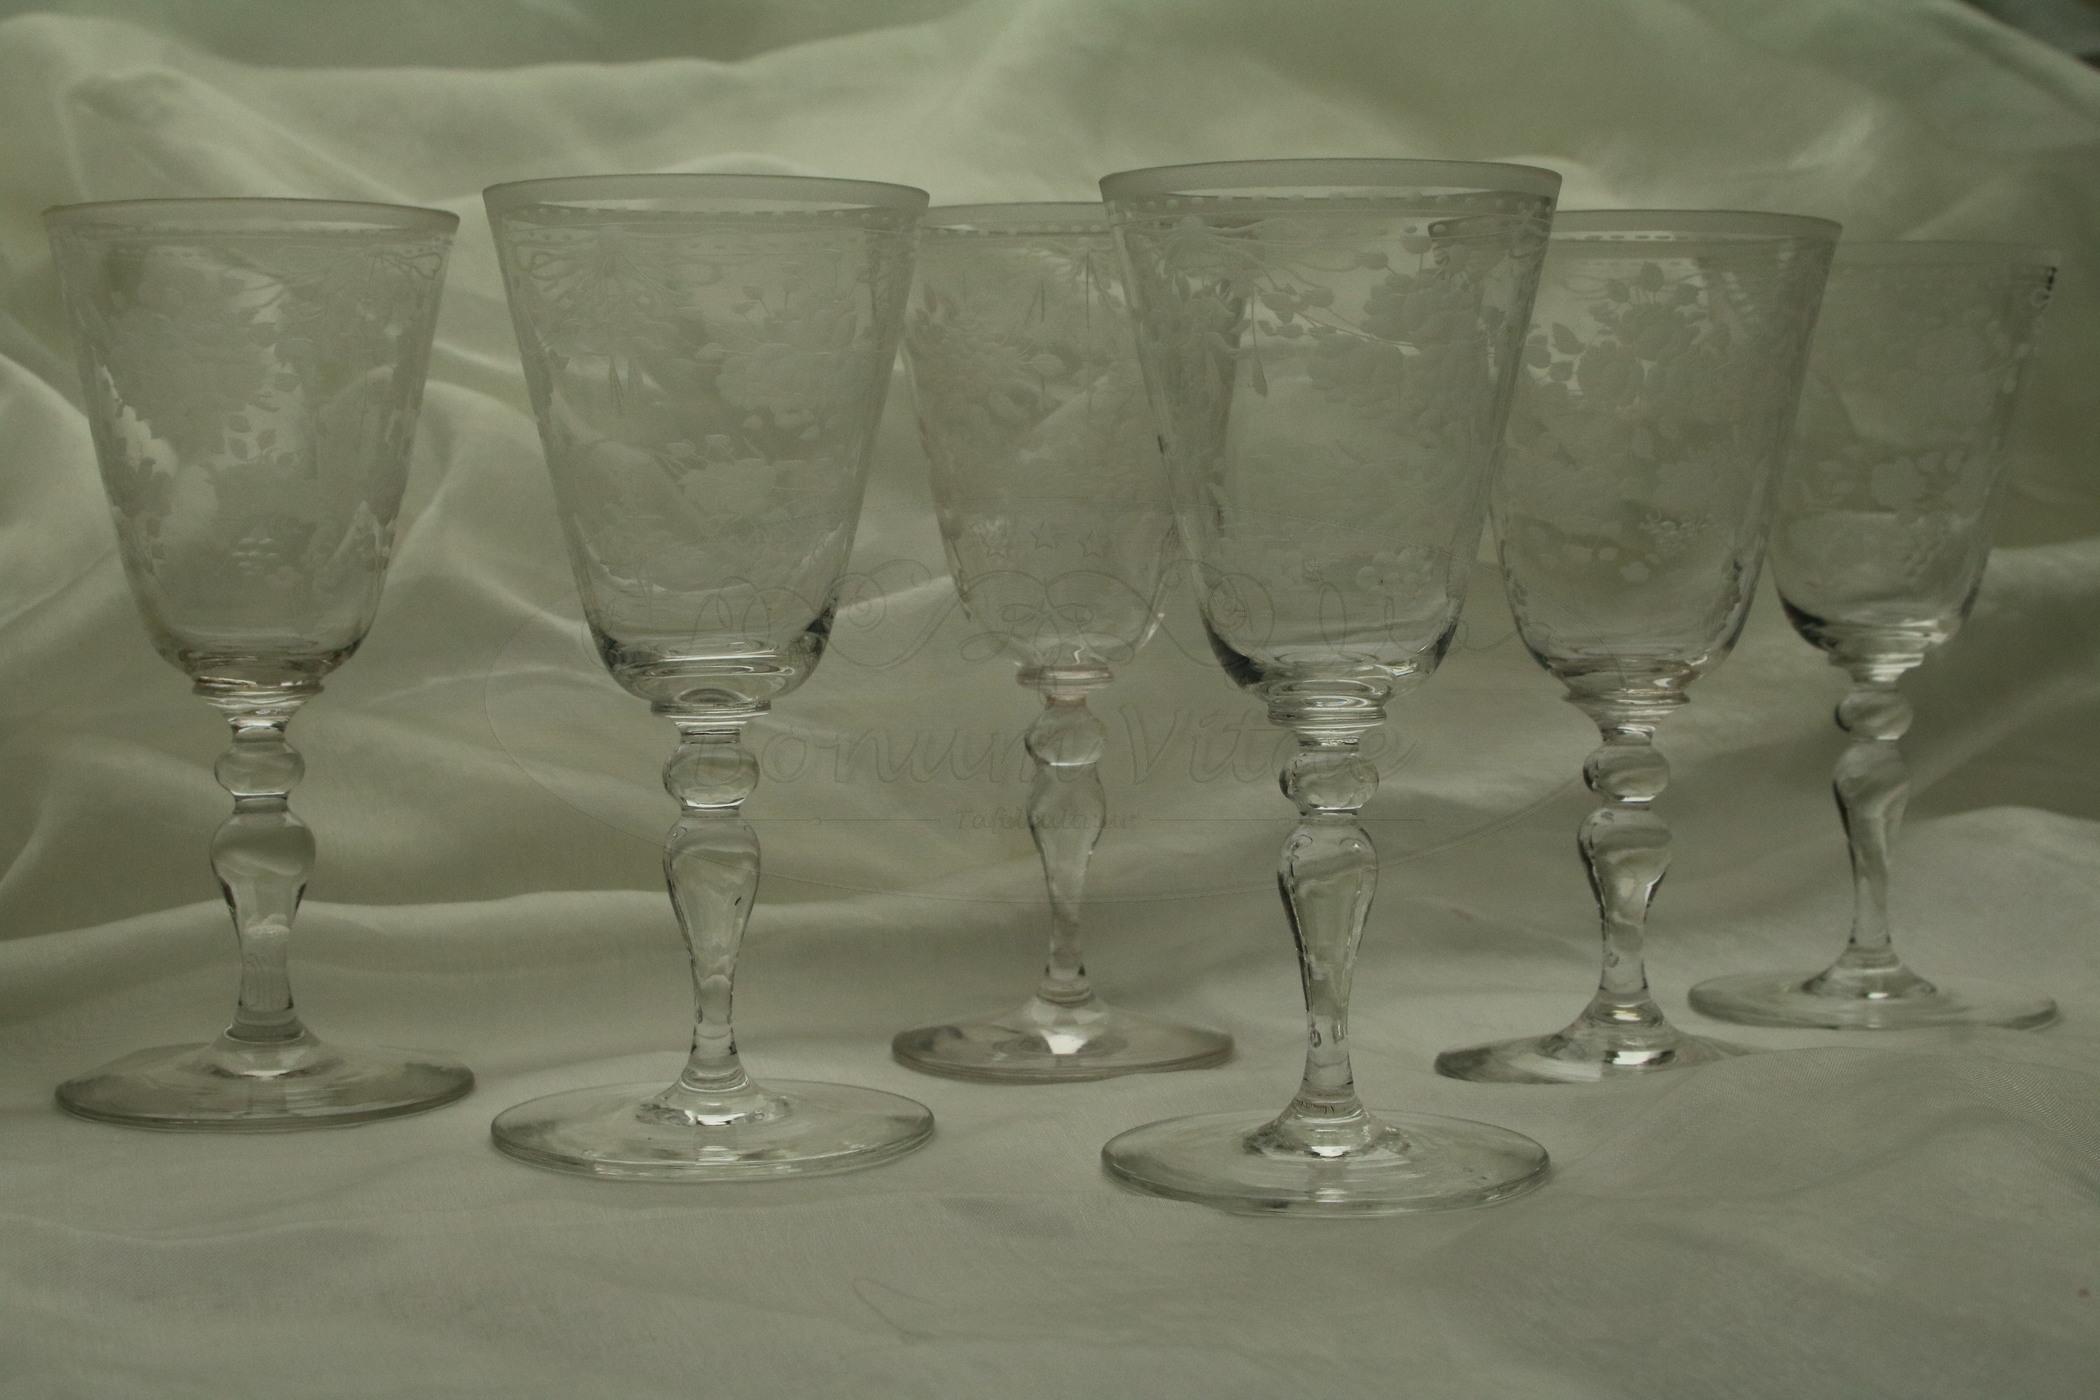 Geëtste glazen - 6 stuks